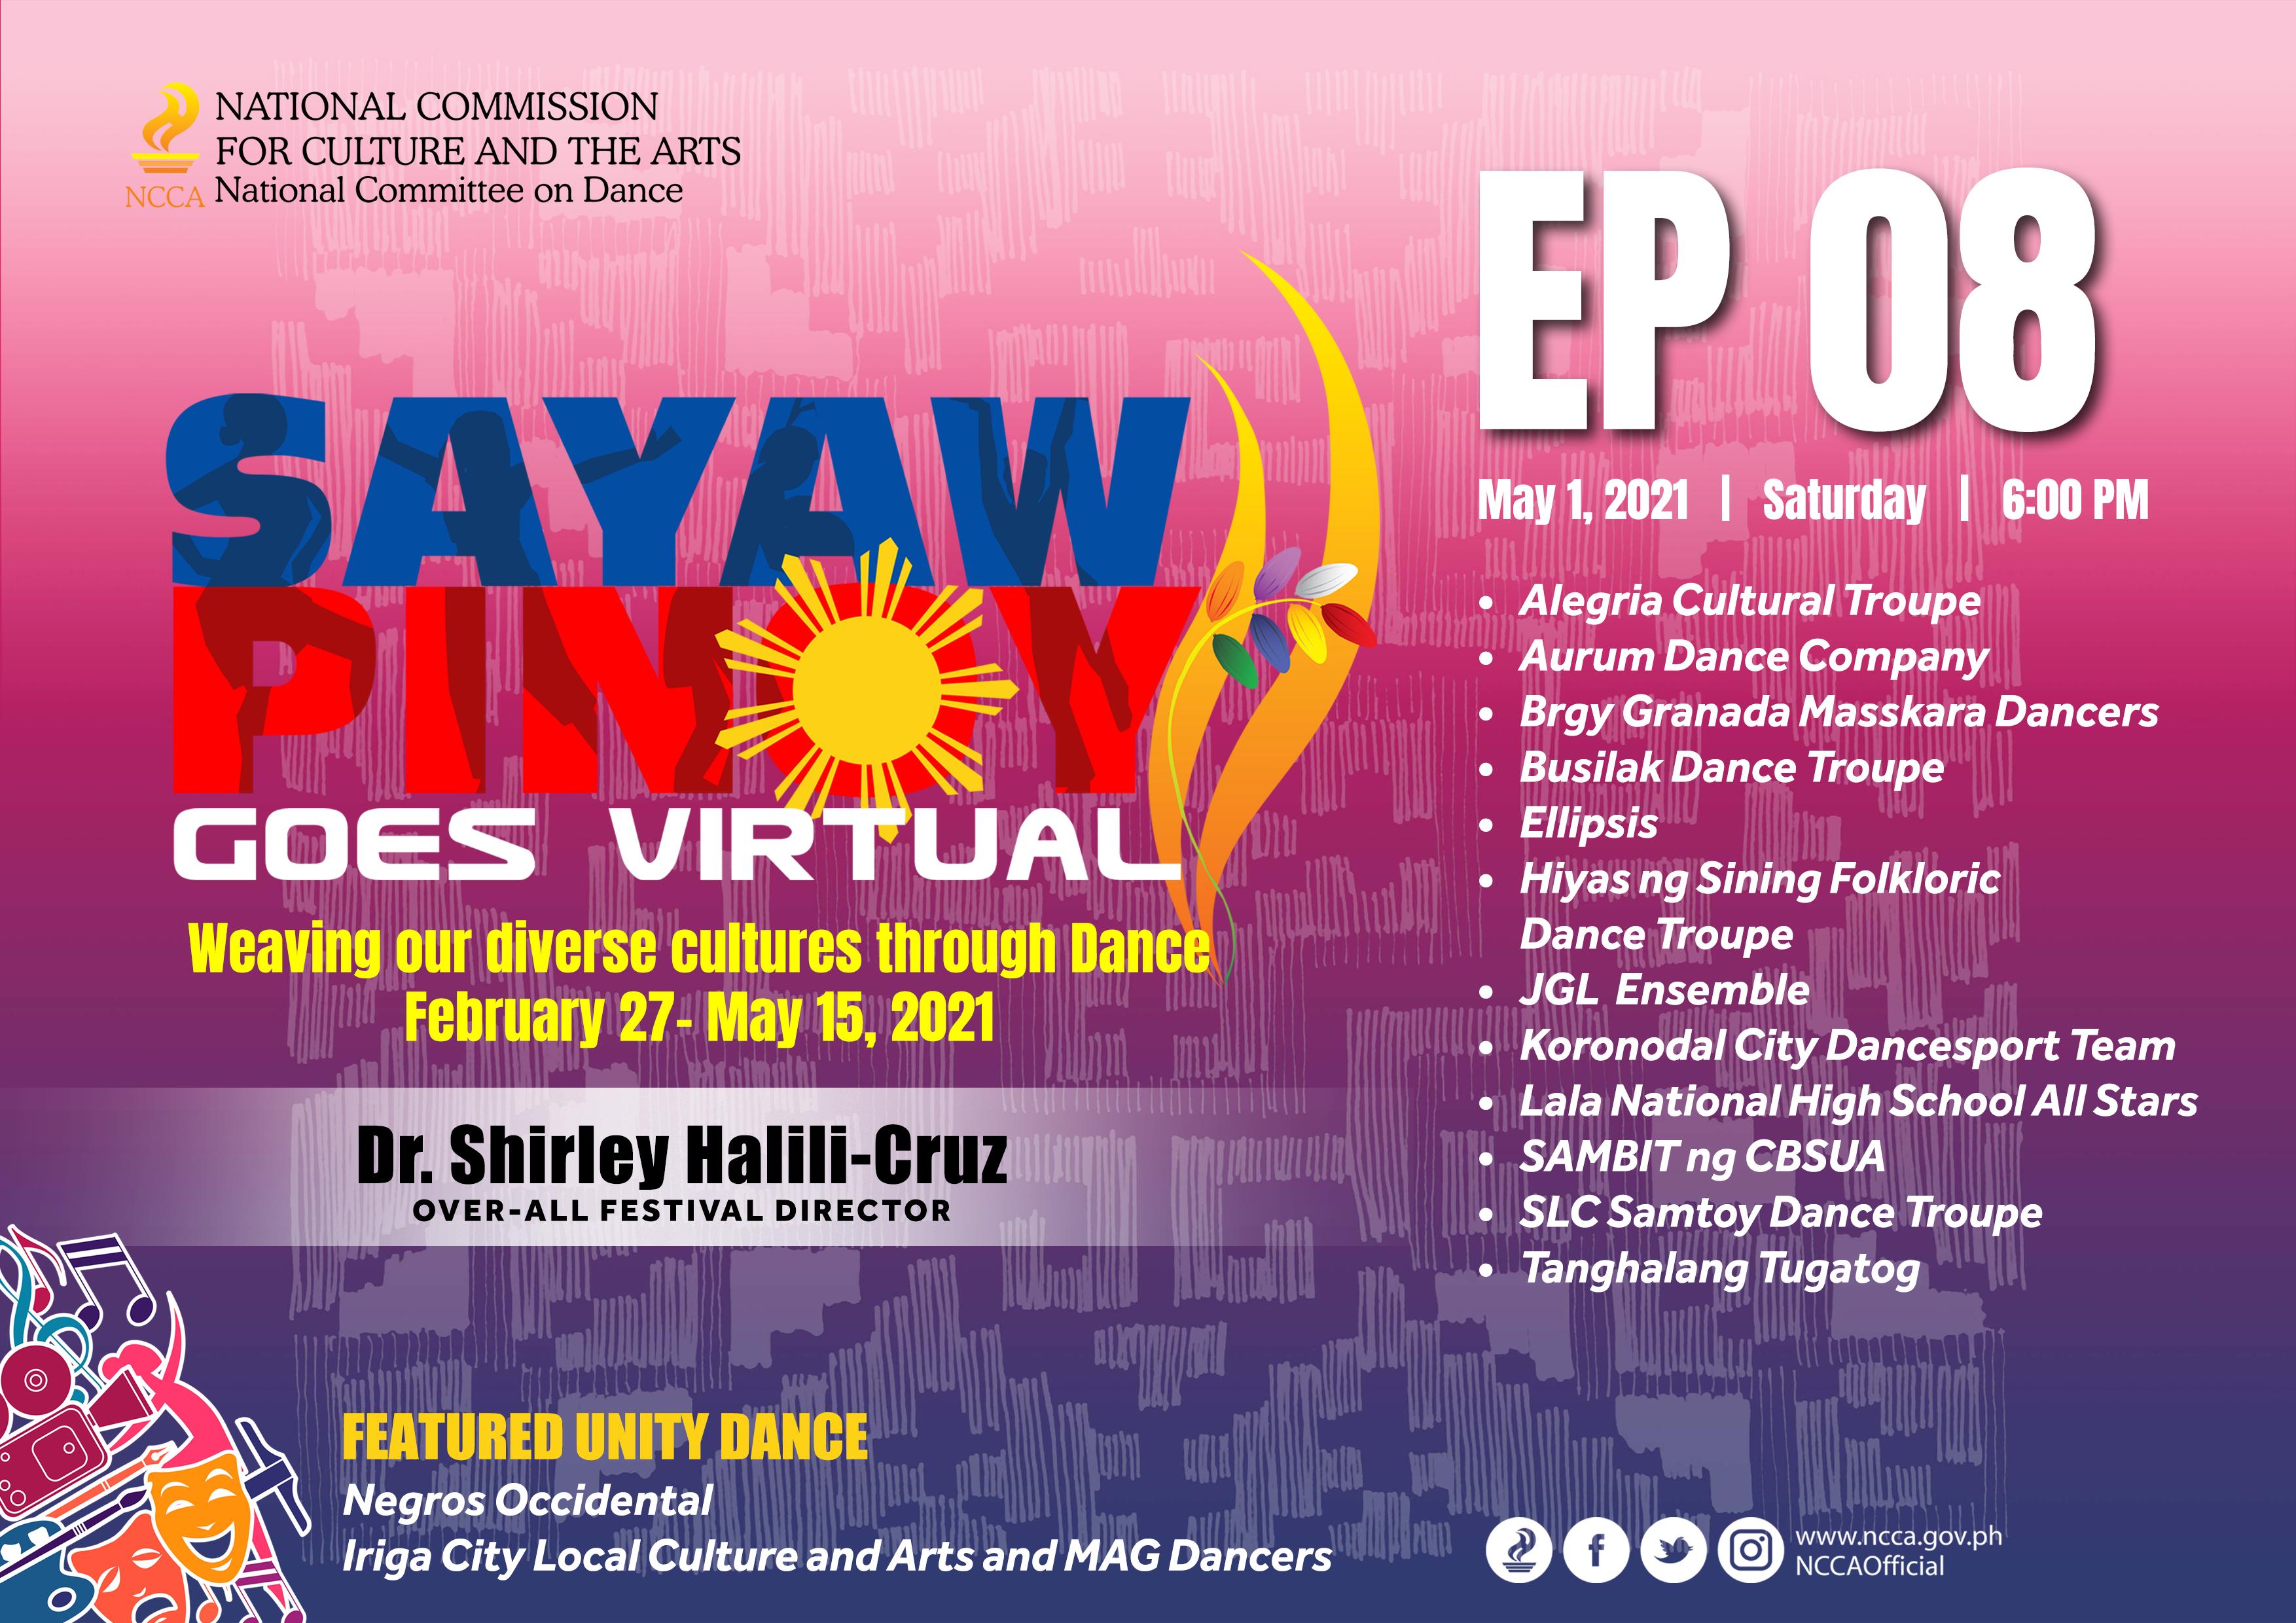 SAMBIT- CBSUA Calabanga, chosen for Sayaw Pinoy Goes Virtual